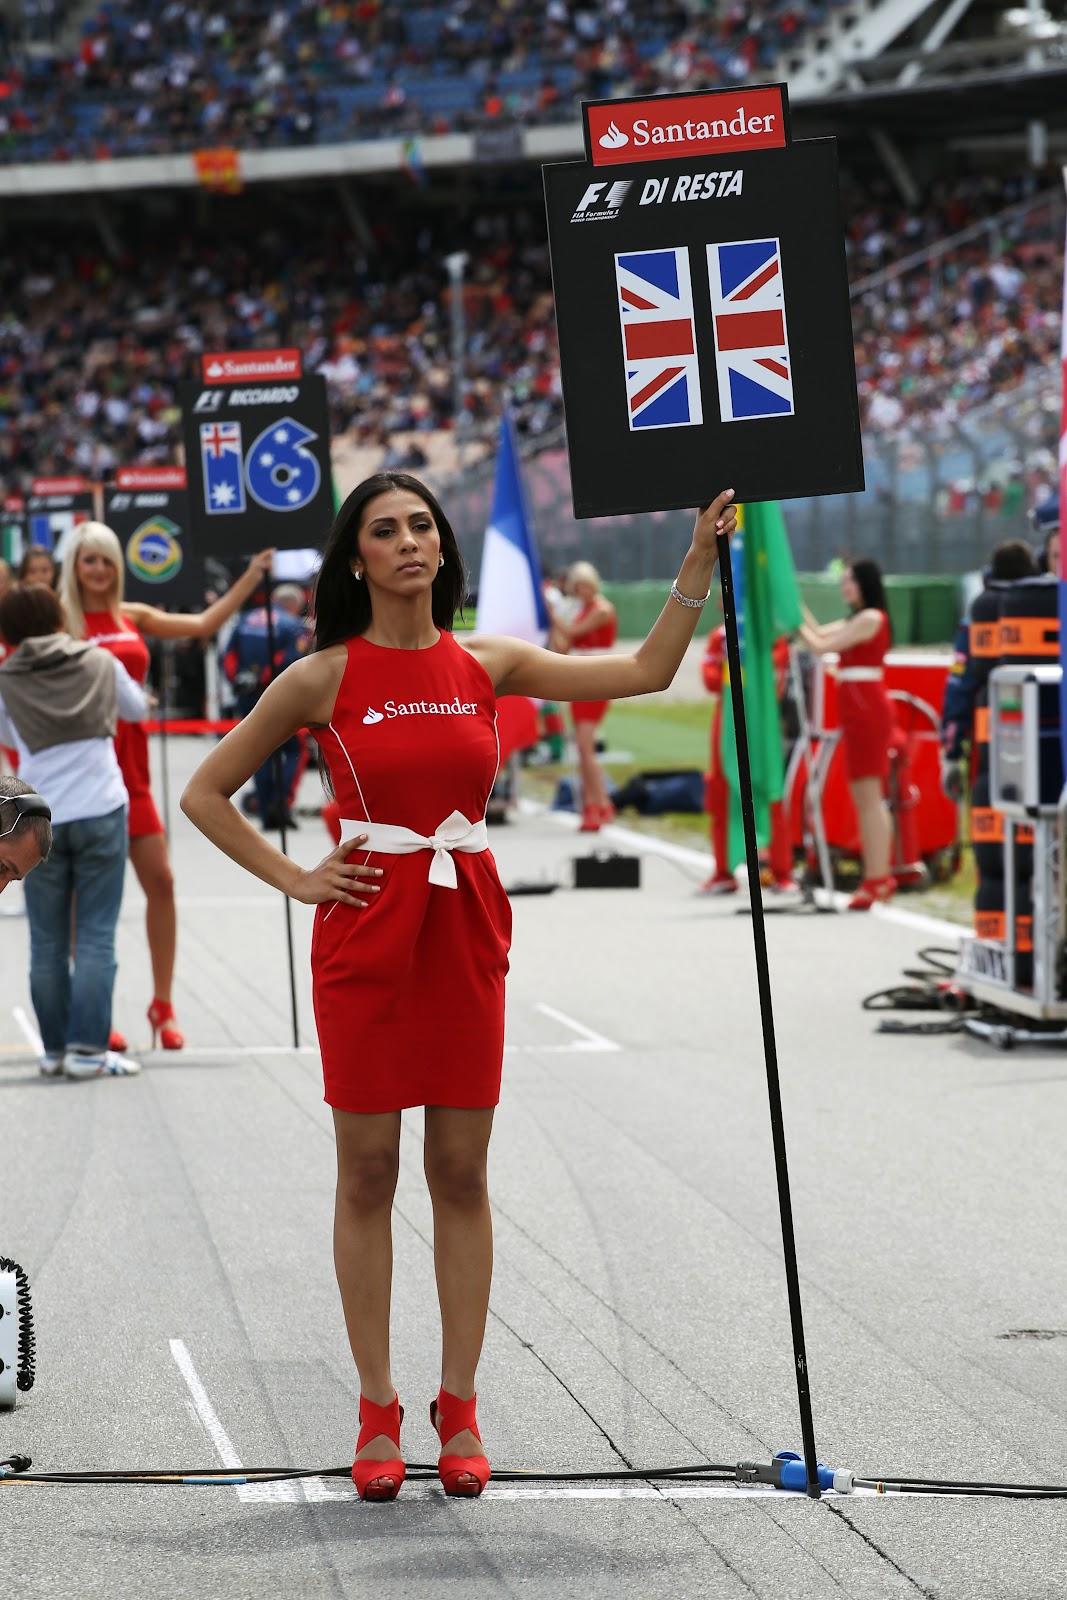 F1: 2012 German Formula 1 Grand Prix